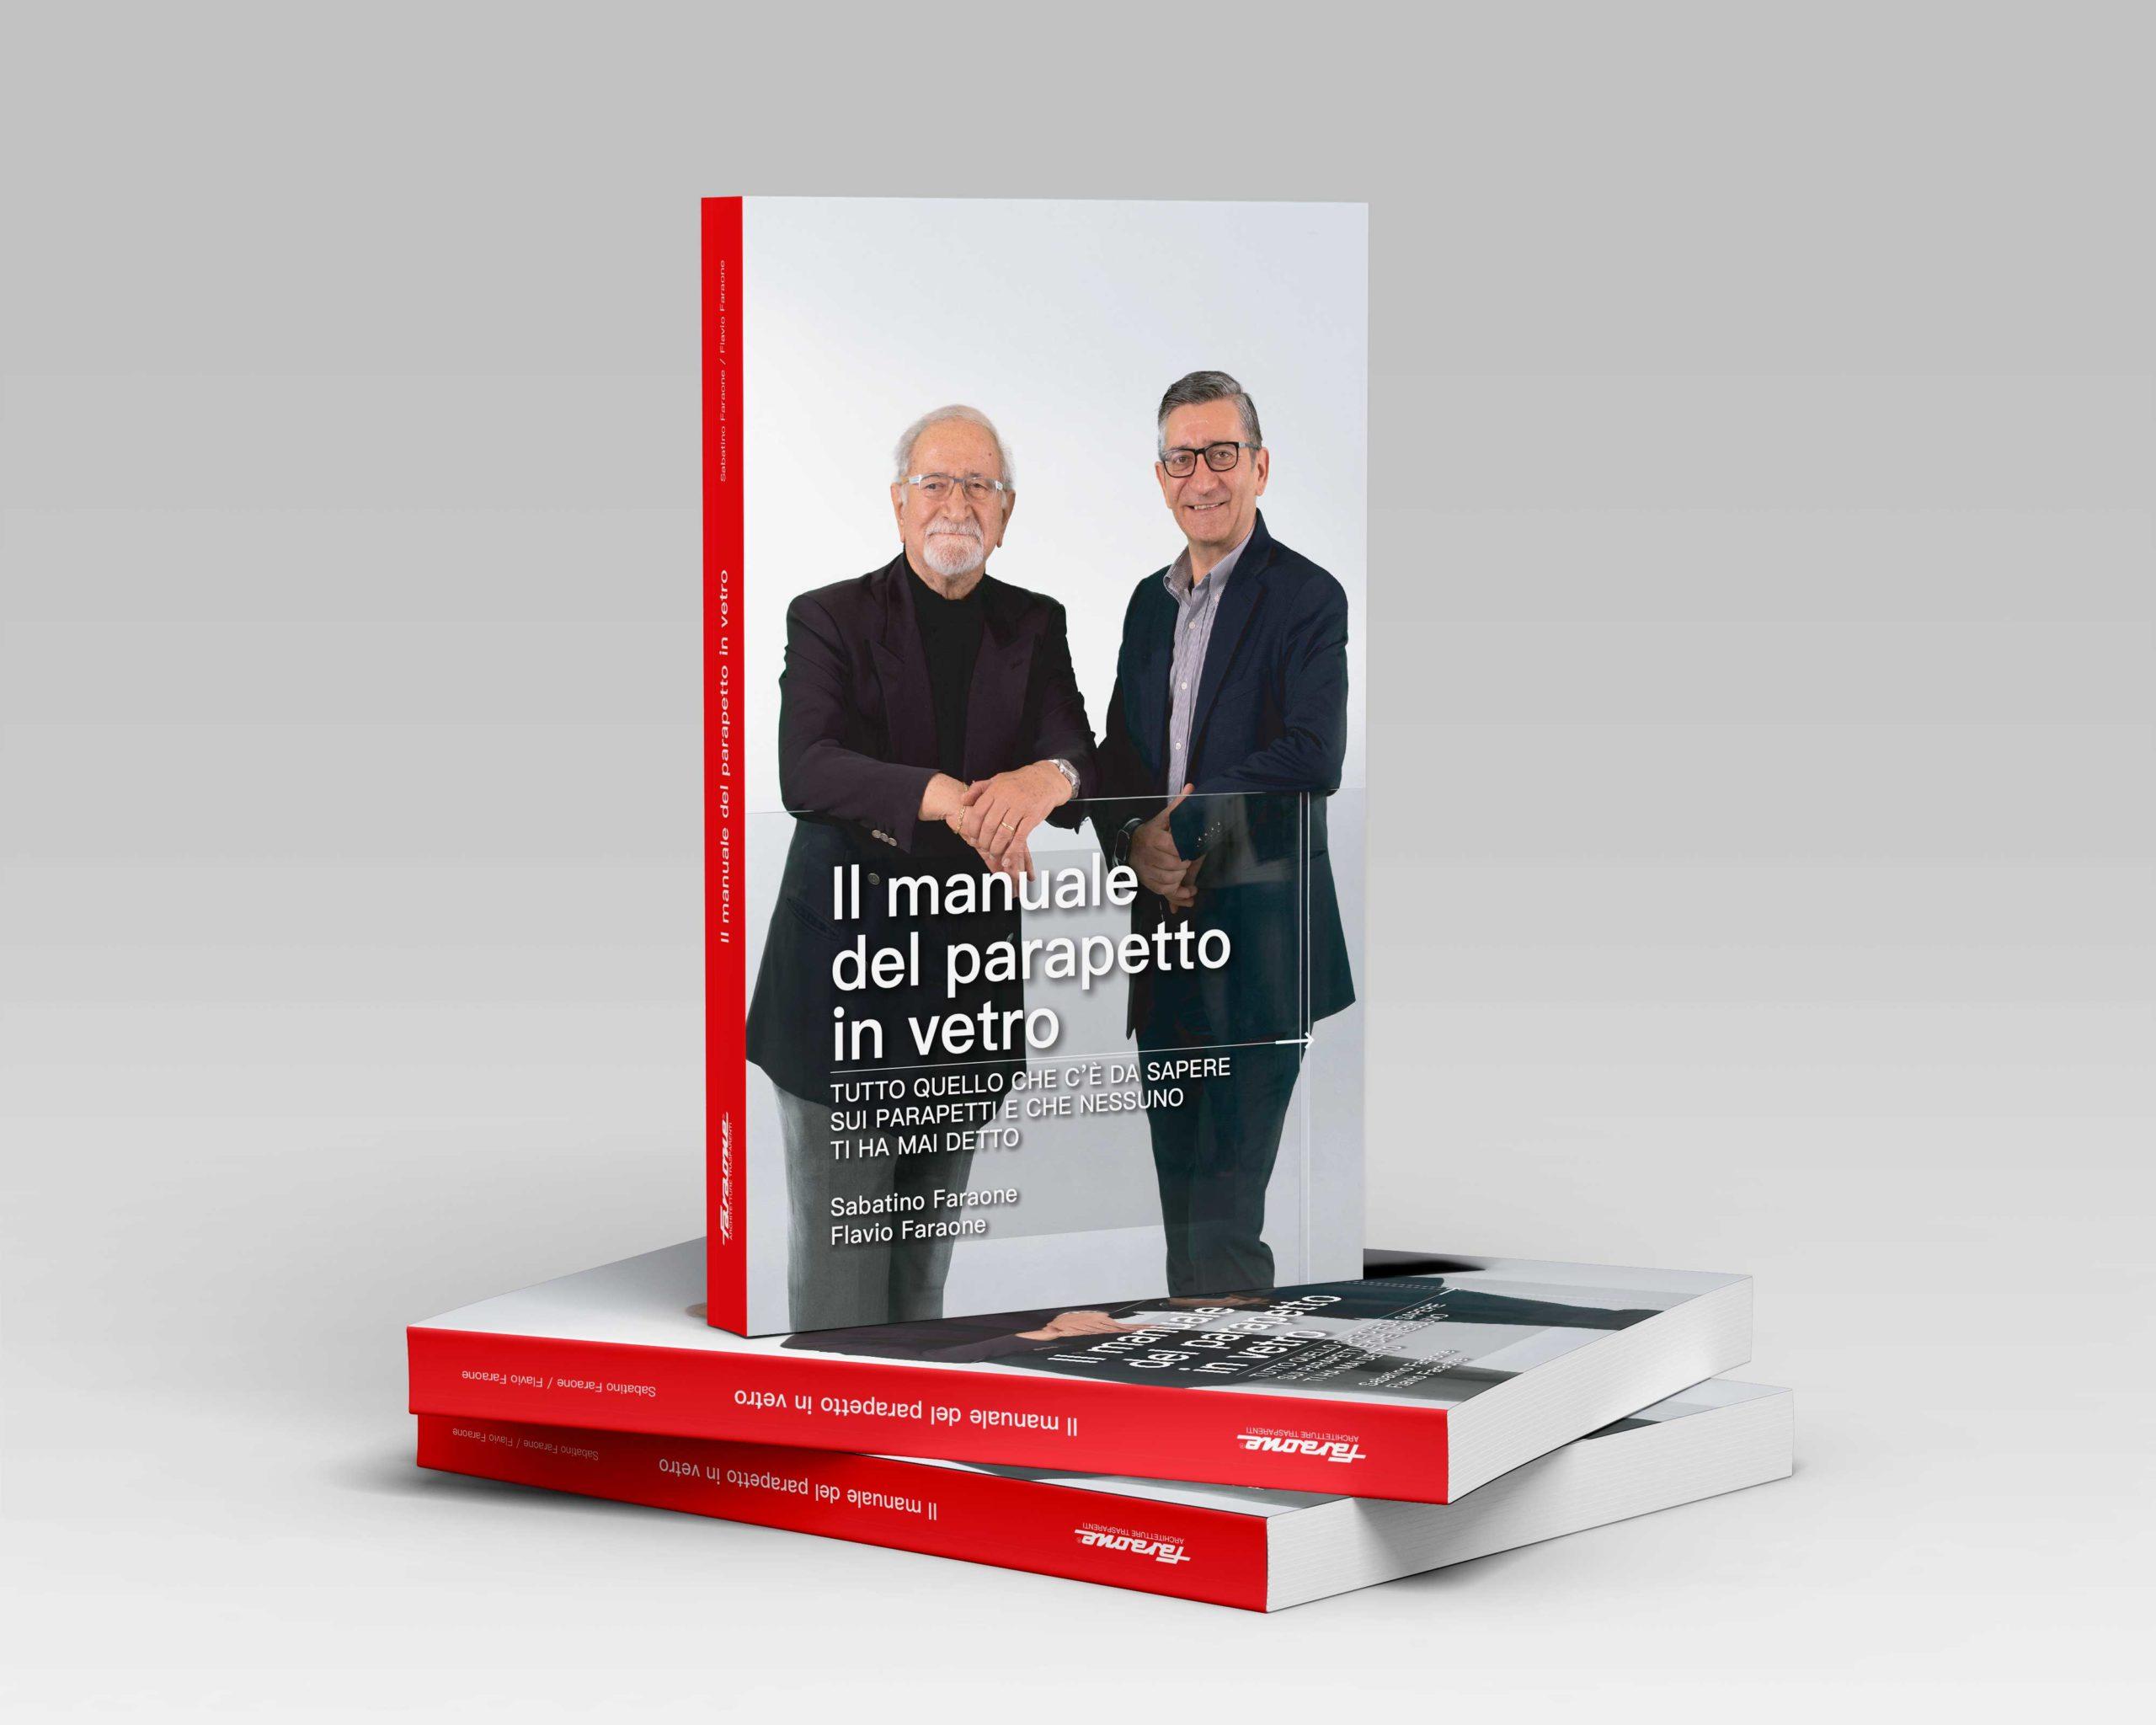 Soft_Cover_Book_Mockup_v01